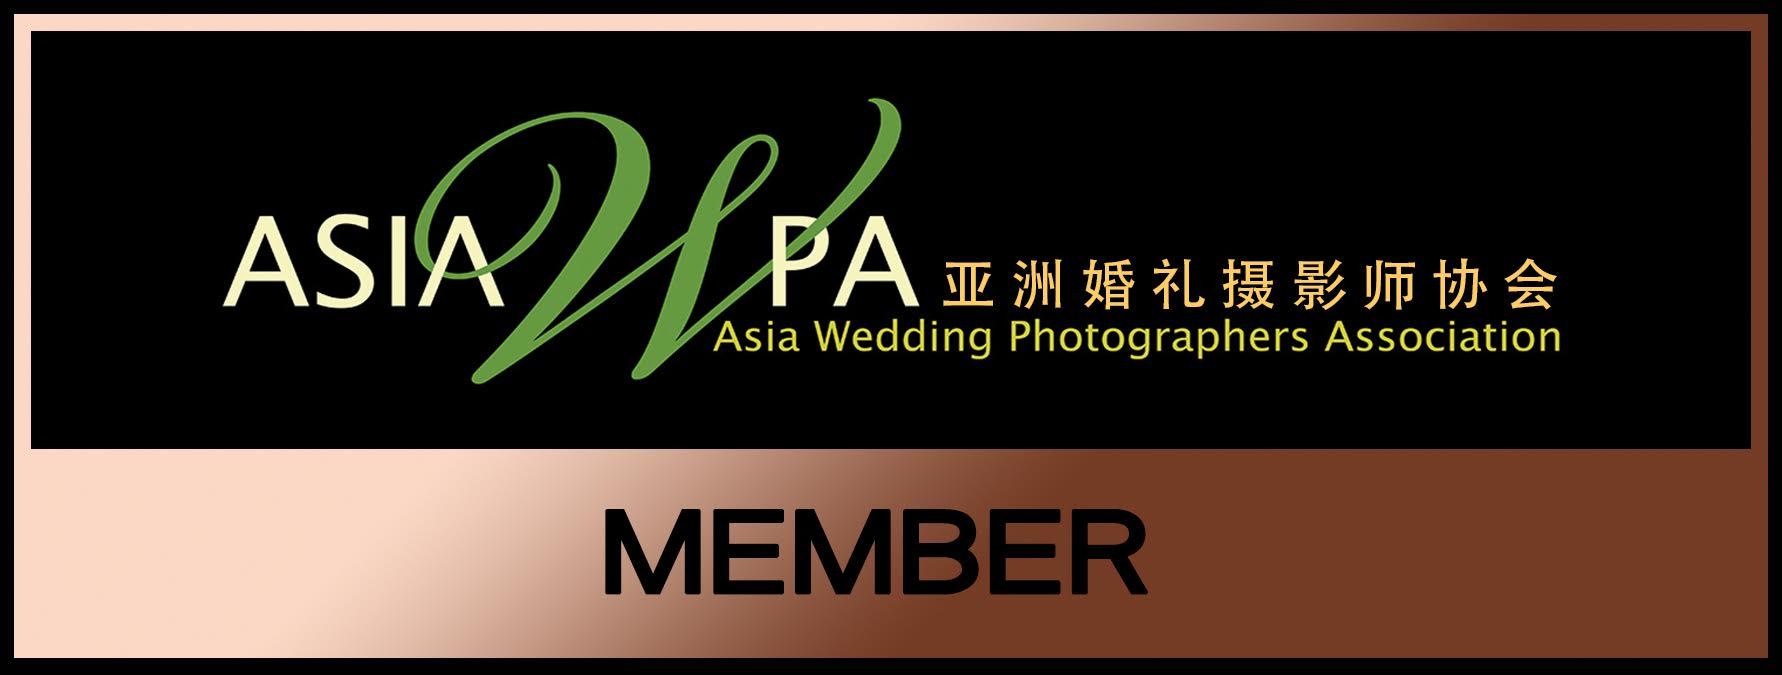 Asia Wedding Photographers Association